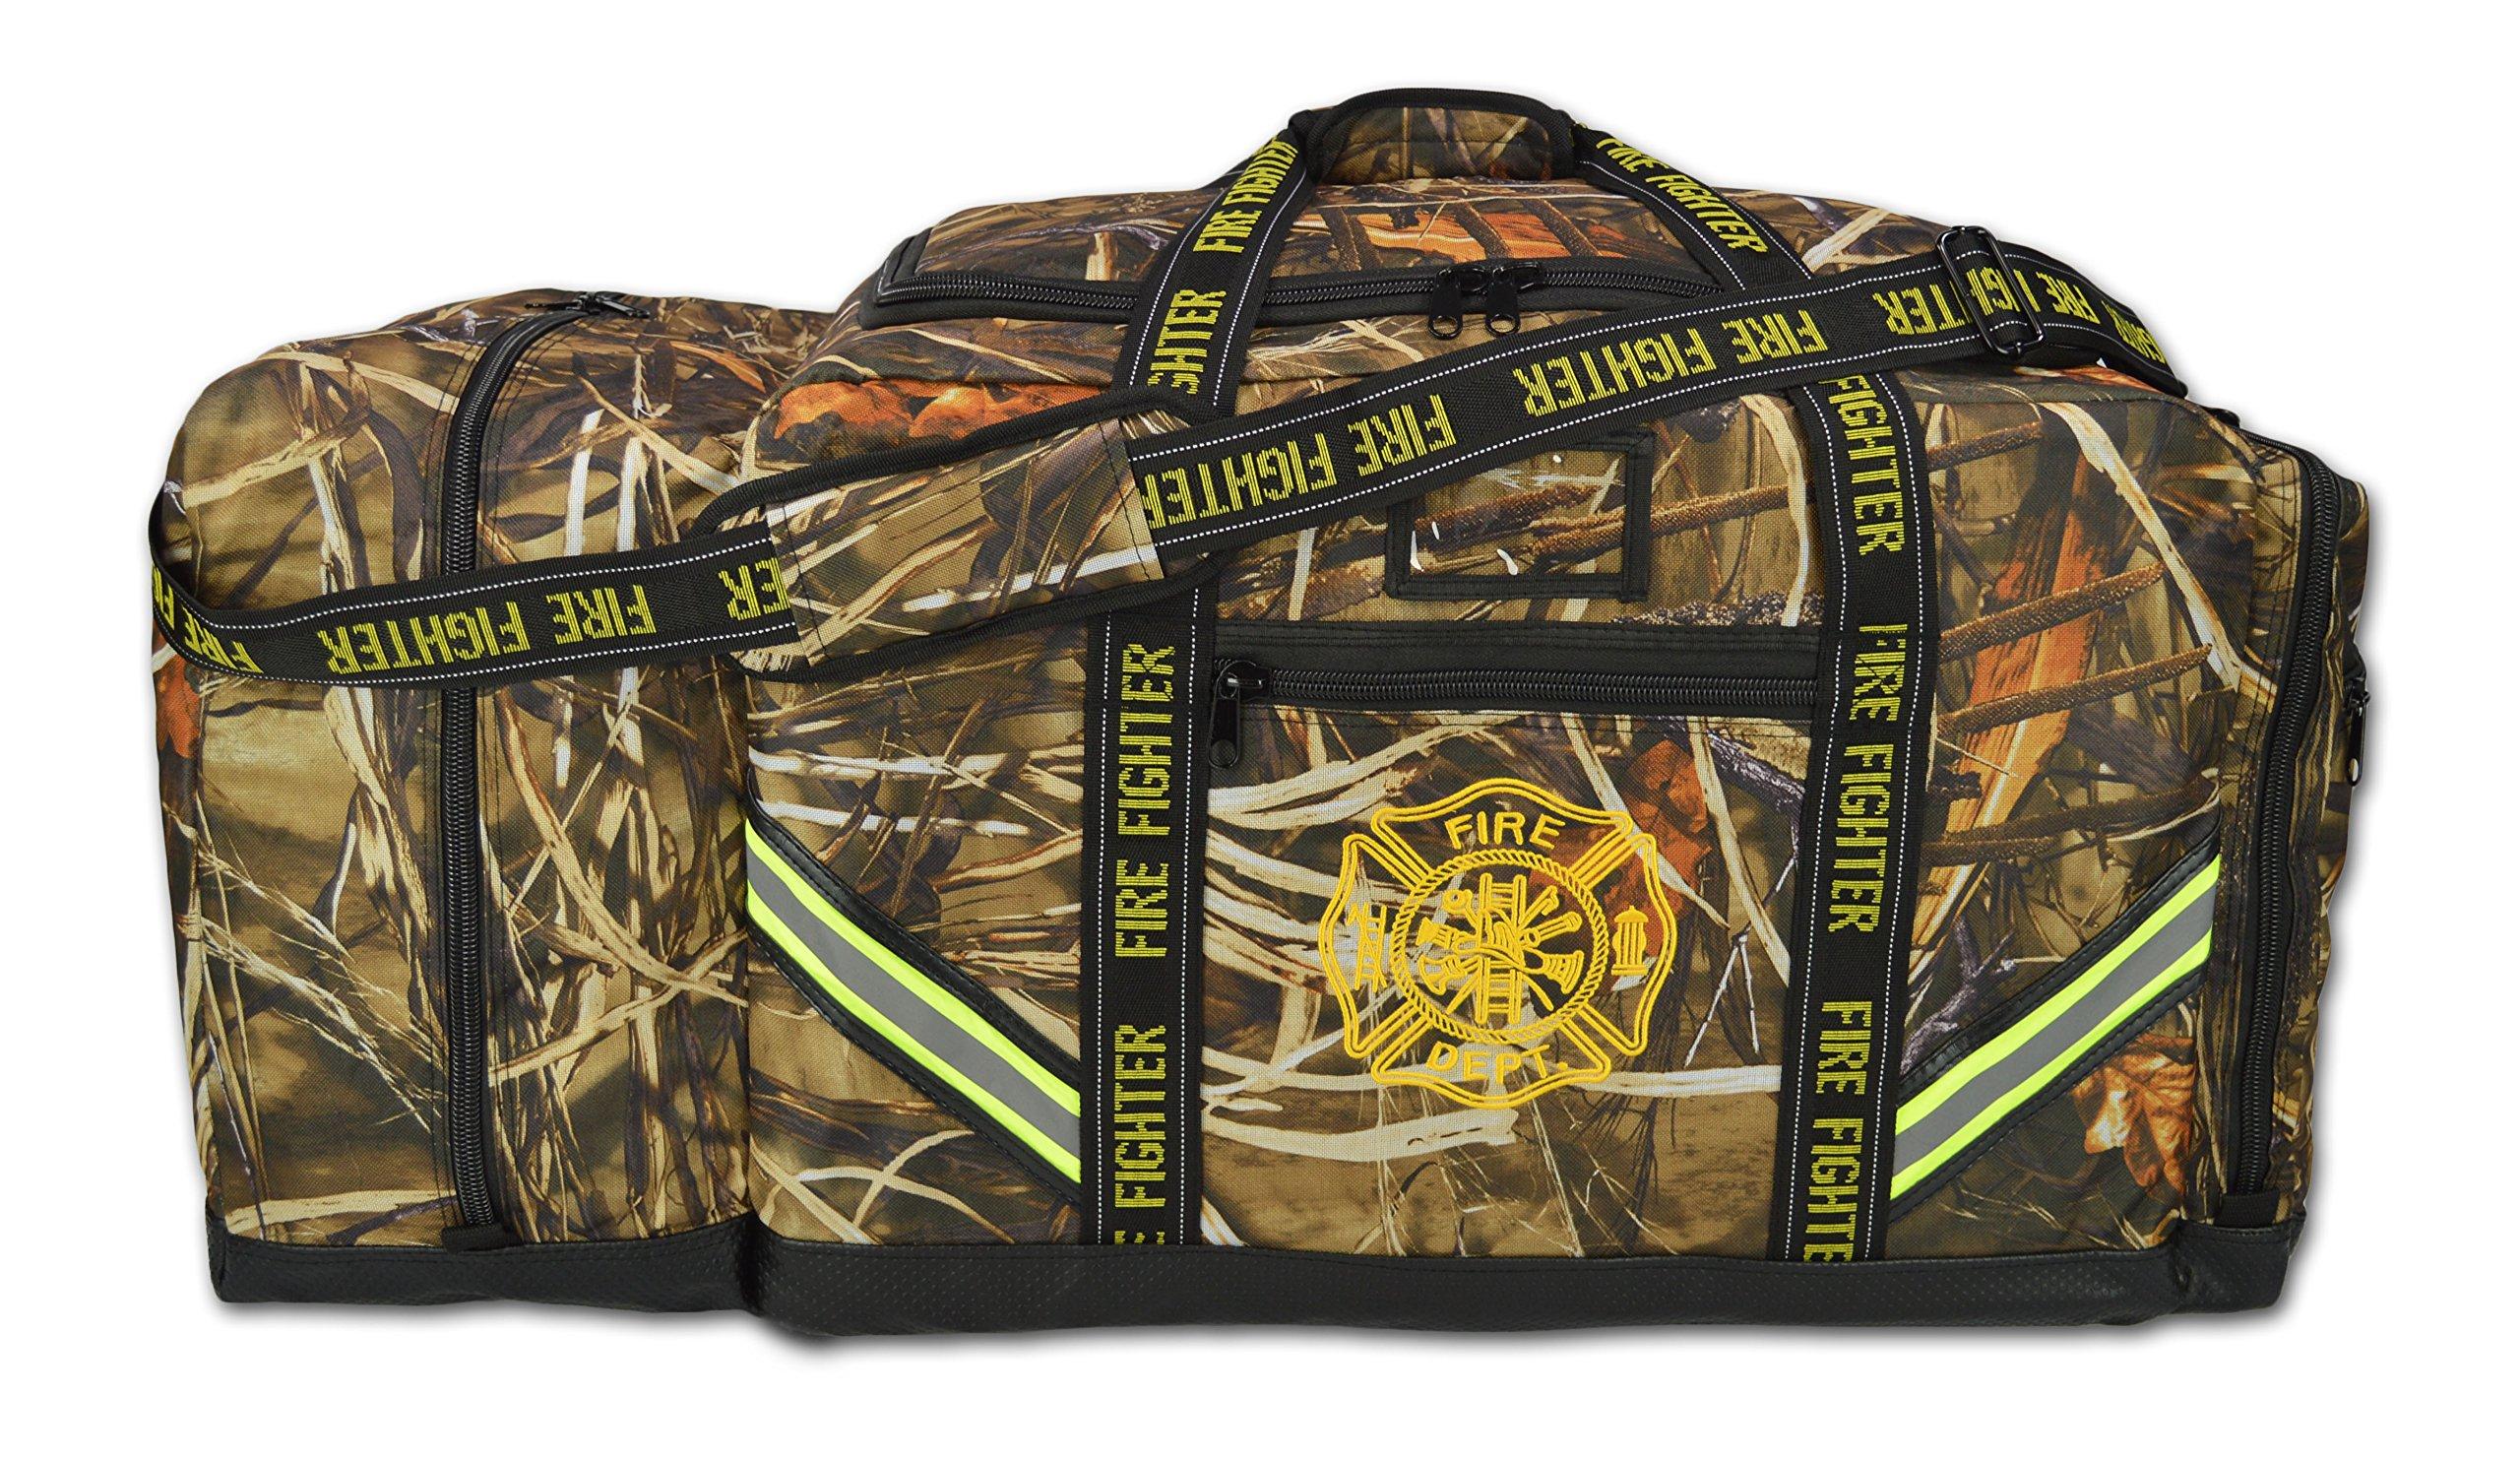 Lightning X Premium Camouflage 3XL Firefighter Step-In Gear Bag w/Helmet Compartment - Deep Woods Camo